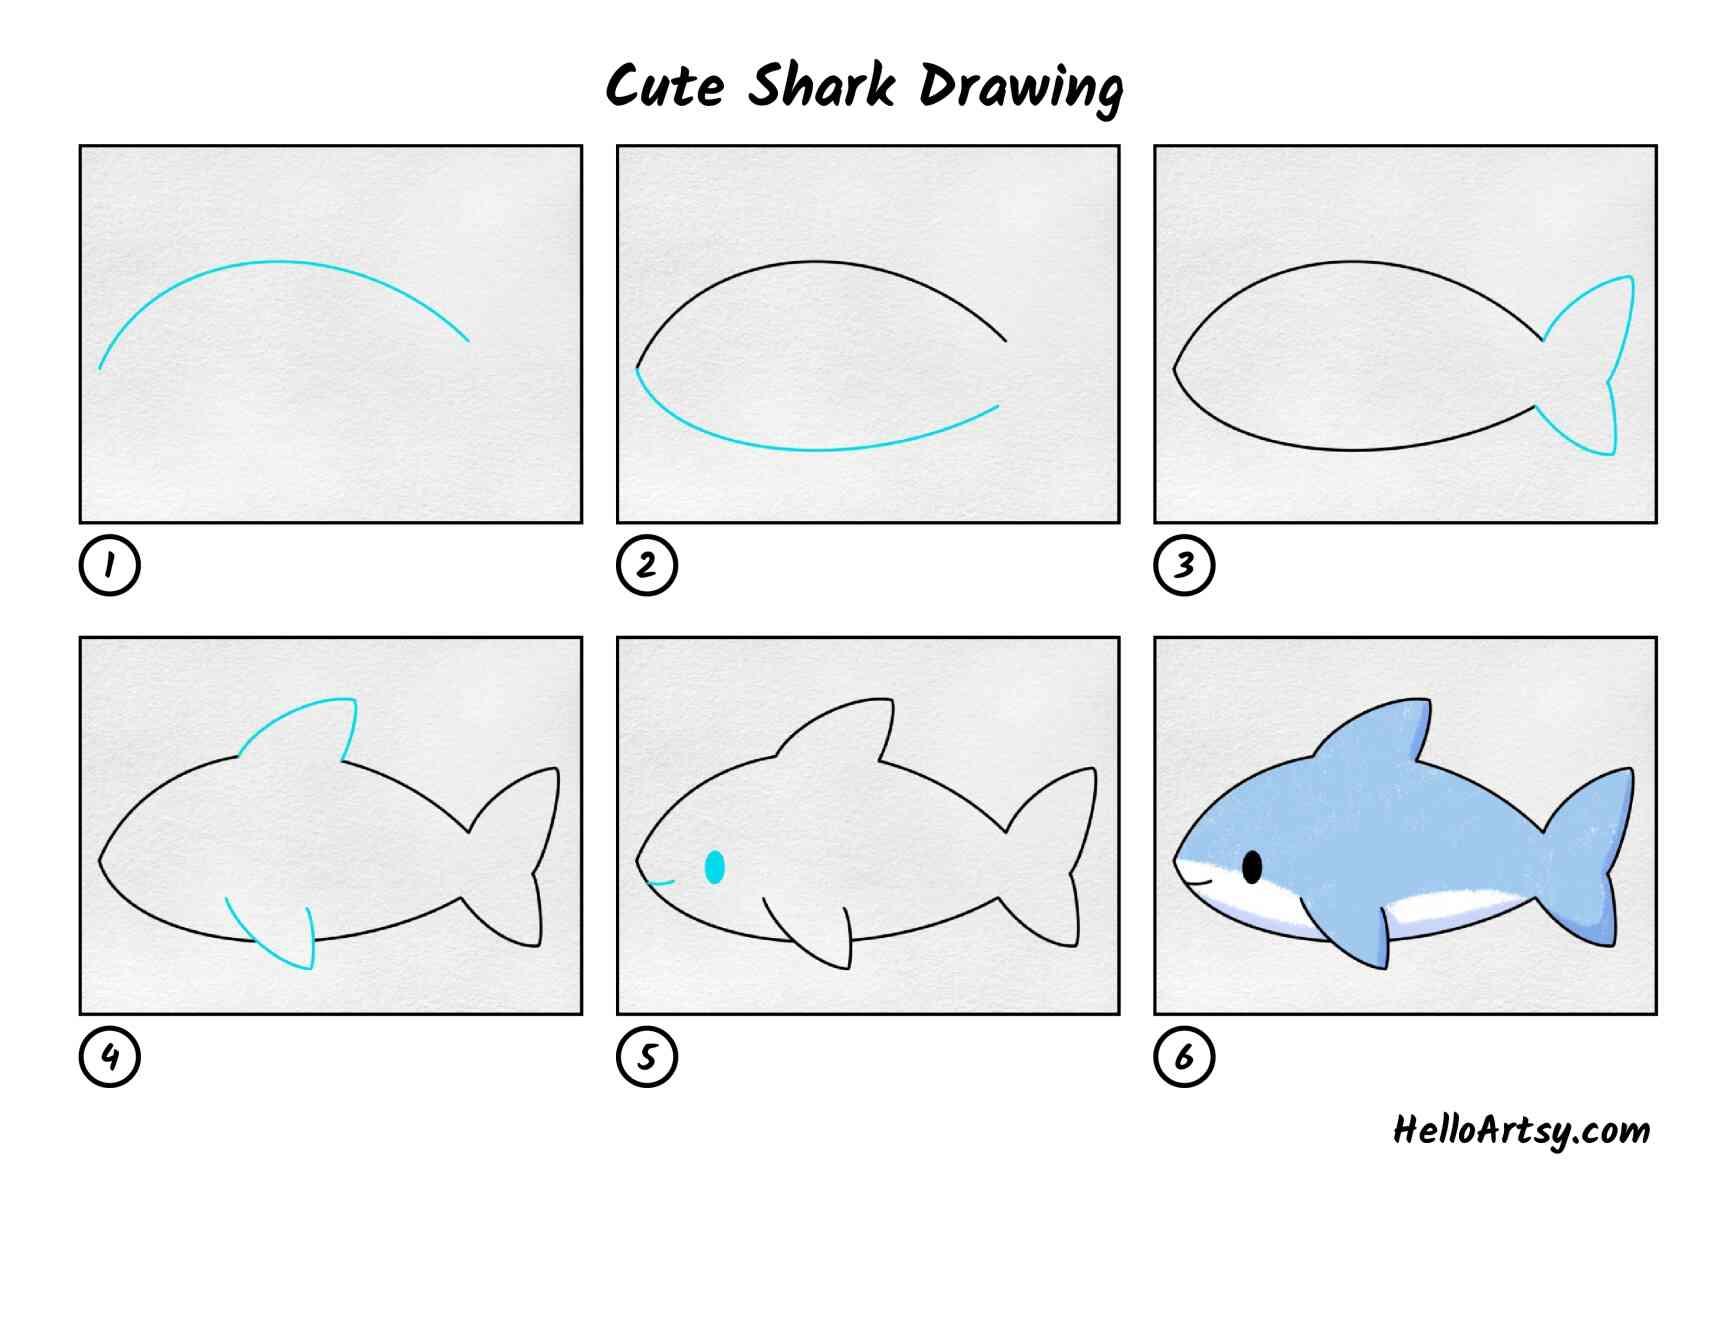 Cute Shark Drawing: All Steps